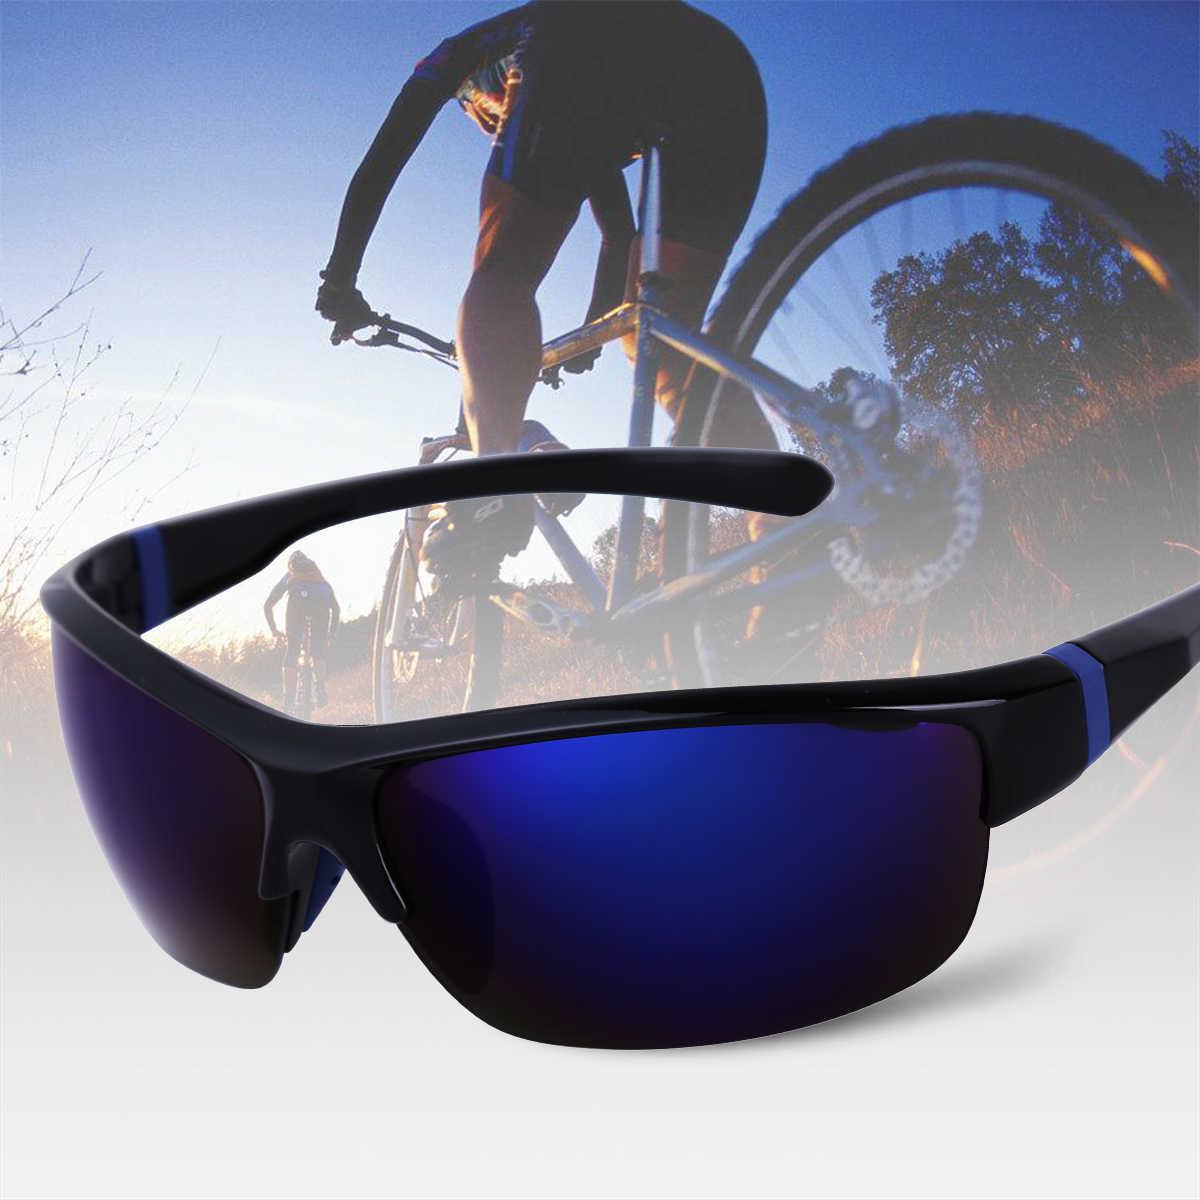 a73a35d111c DPOIS Sunglasses Men Sport Sunglasses Polarized UV 400 Protection Golf Sun  Glasses Women Driving Cycling Glasses